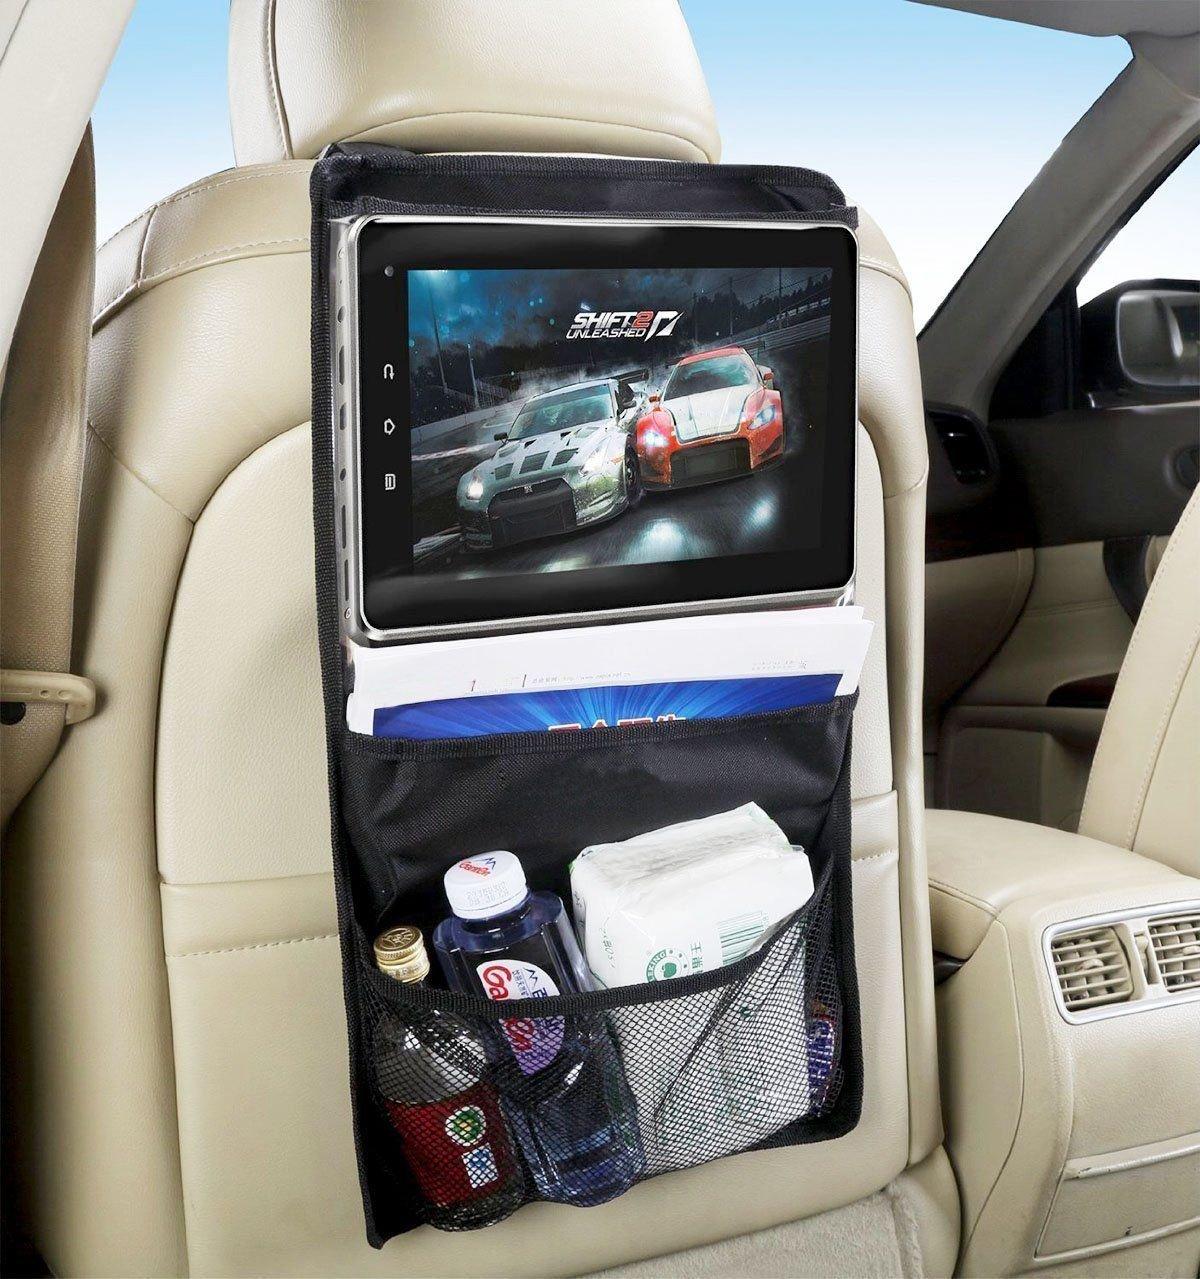 Tablet halterung auto, tablet halter auto, rücksitz organizer, tablet autohalterung, kfz halterung, tablet halterung kopfstütze, auto rücksitz organizer, tablet halter kfz, tablet halterung kfz. Kompatibel mit allen tablets bis 14 : iPad 2/3/4/ , Ipad Air,